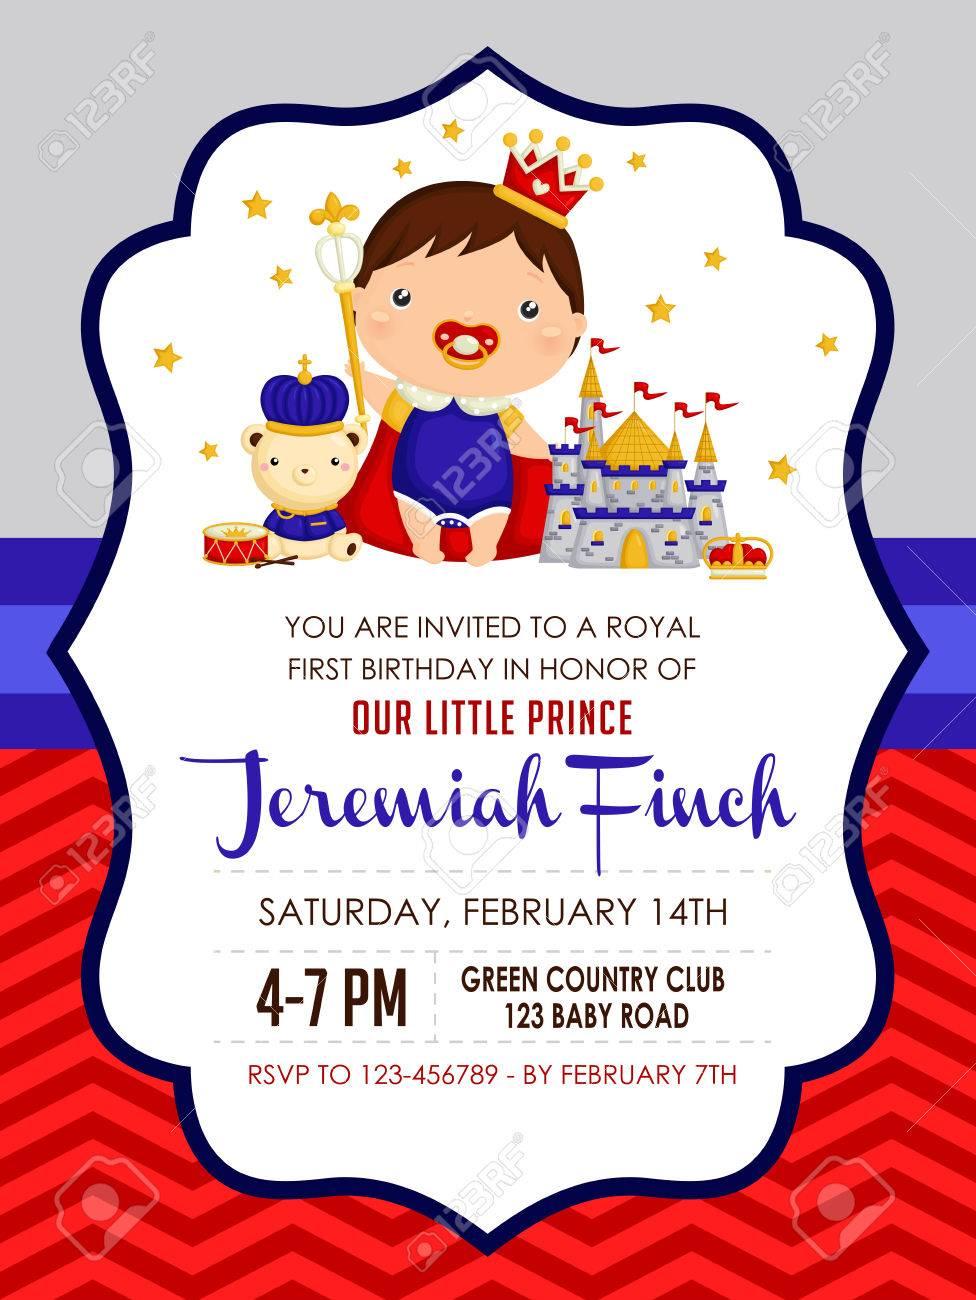 Baby Prince Birthday Invitation Royalty Free Cliparts Vectors – Prince Birthday Invitation